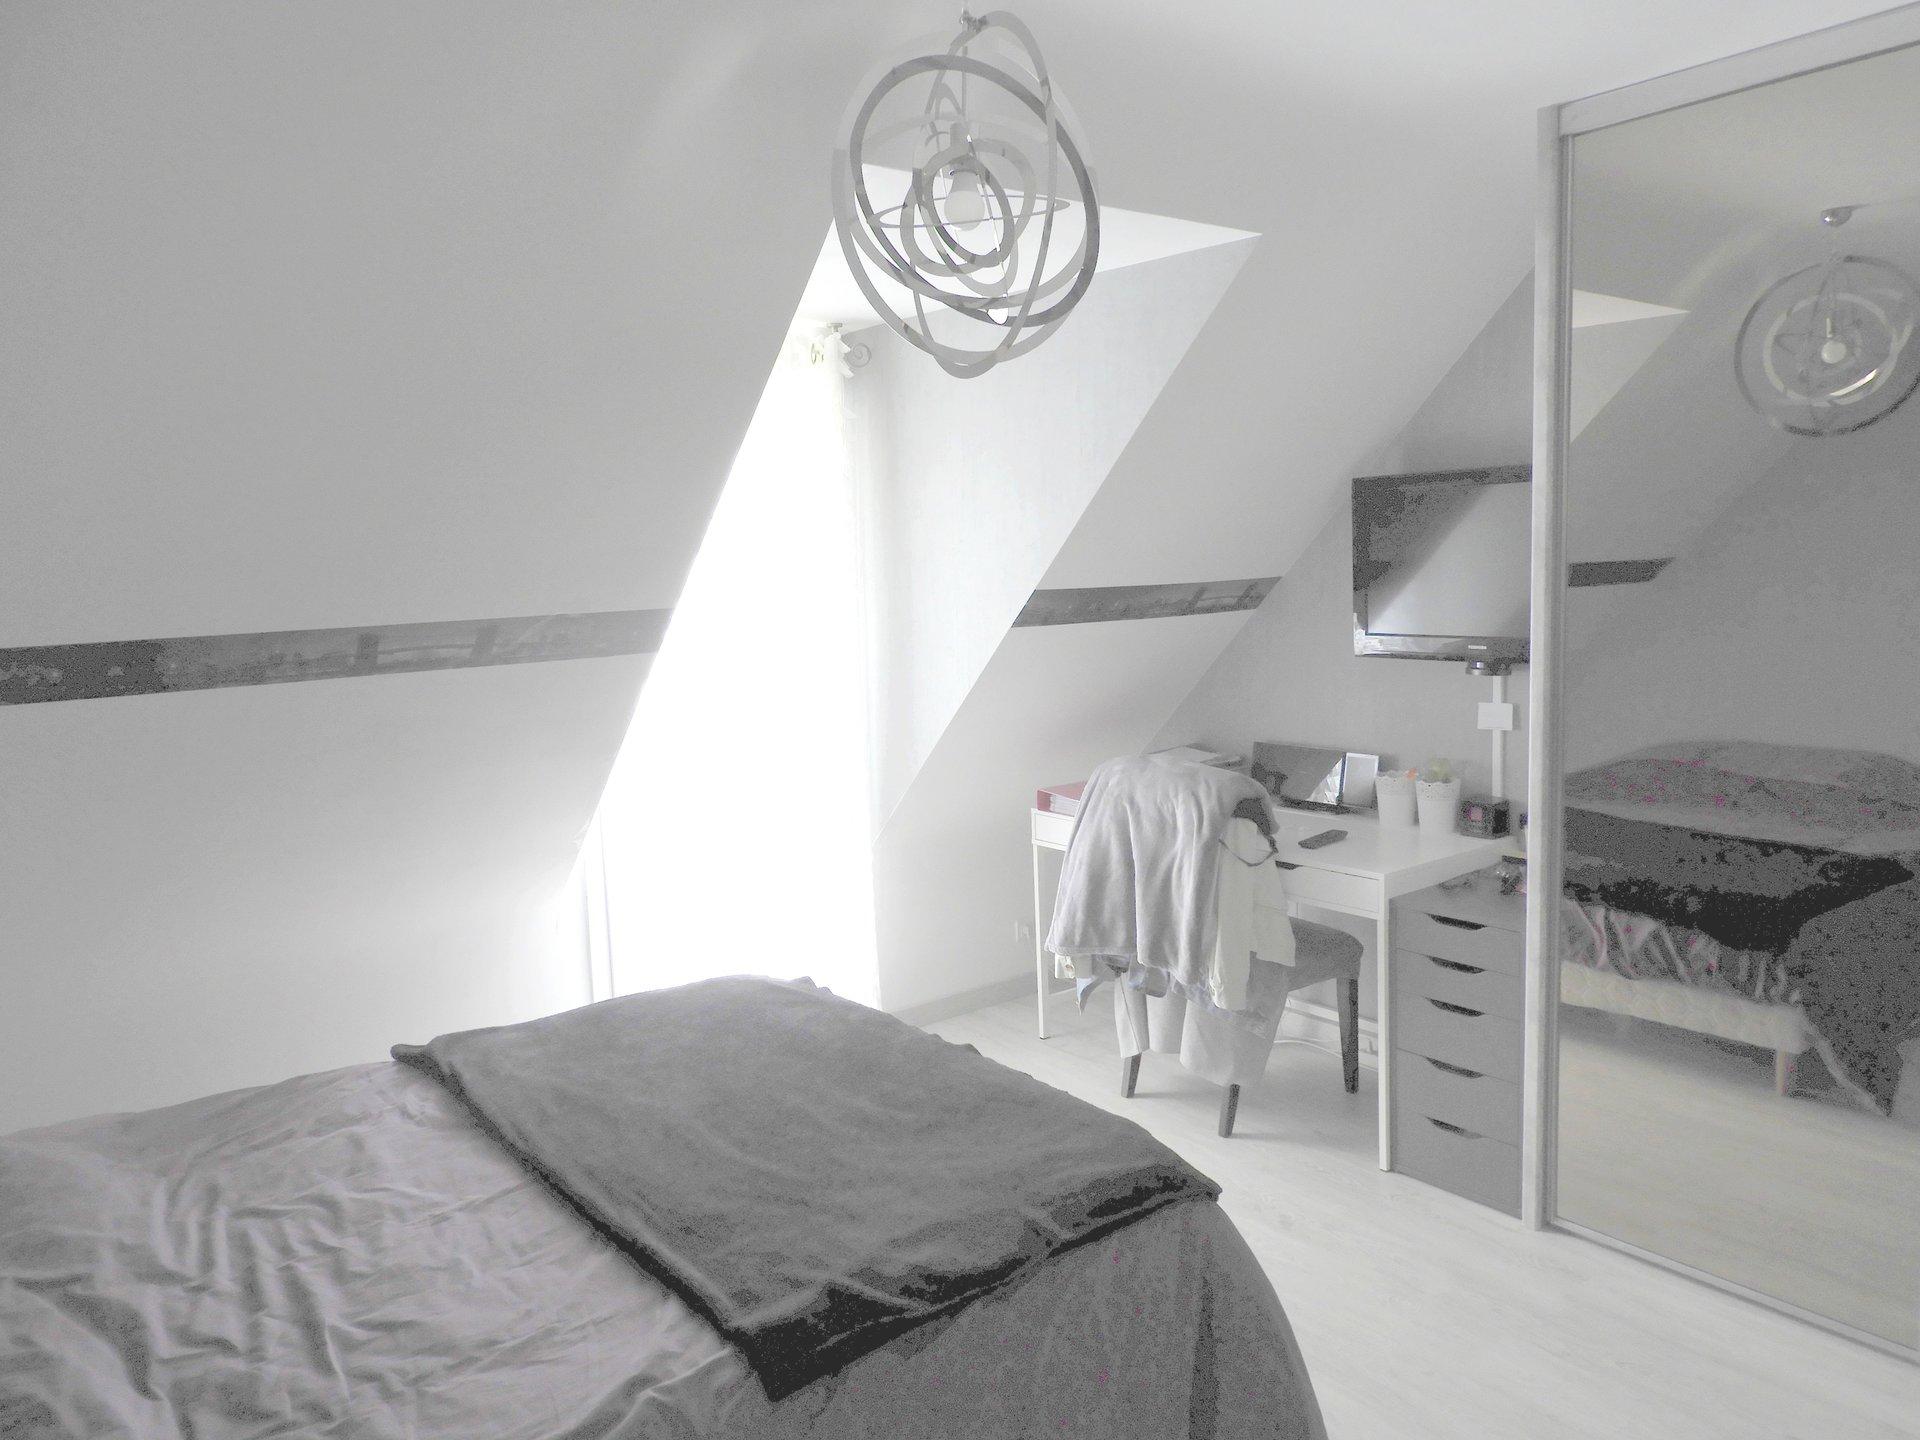 Superbe maison contemporaine!! A 10 MIN de Carhaix